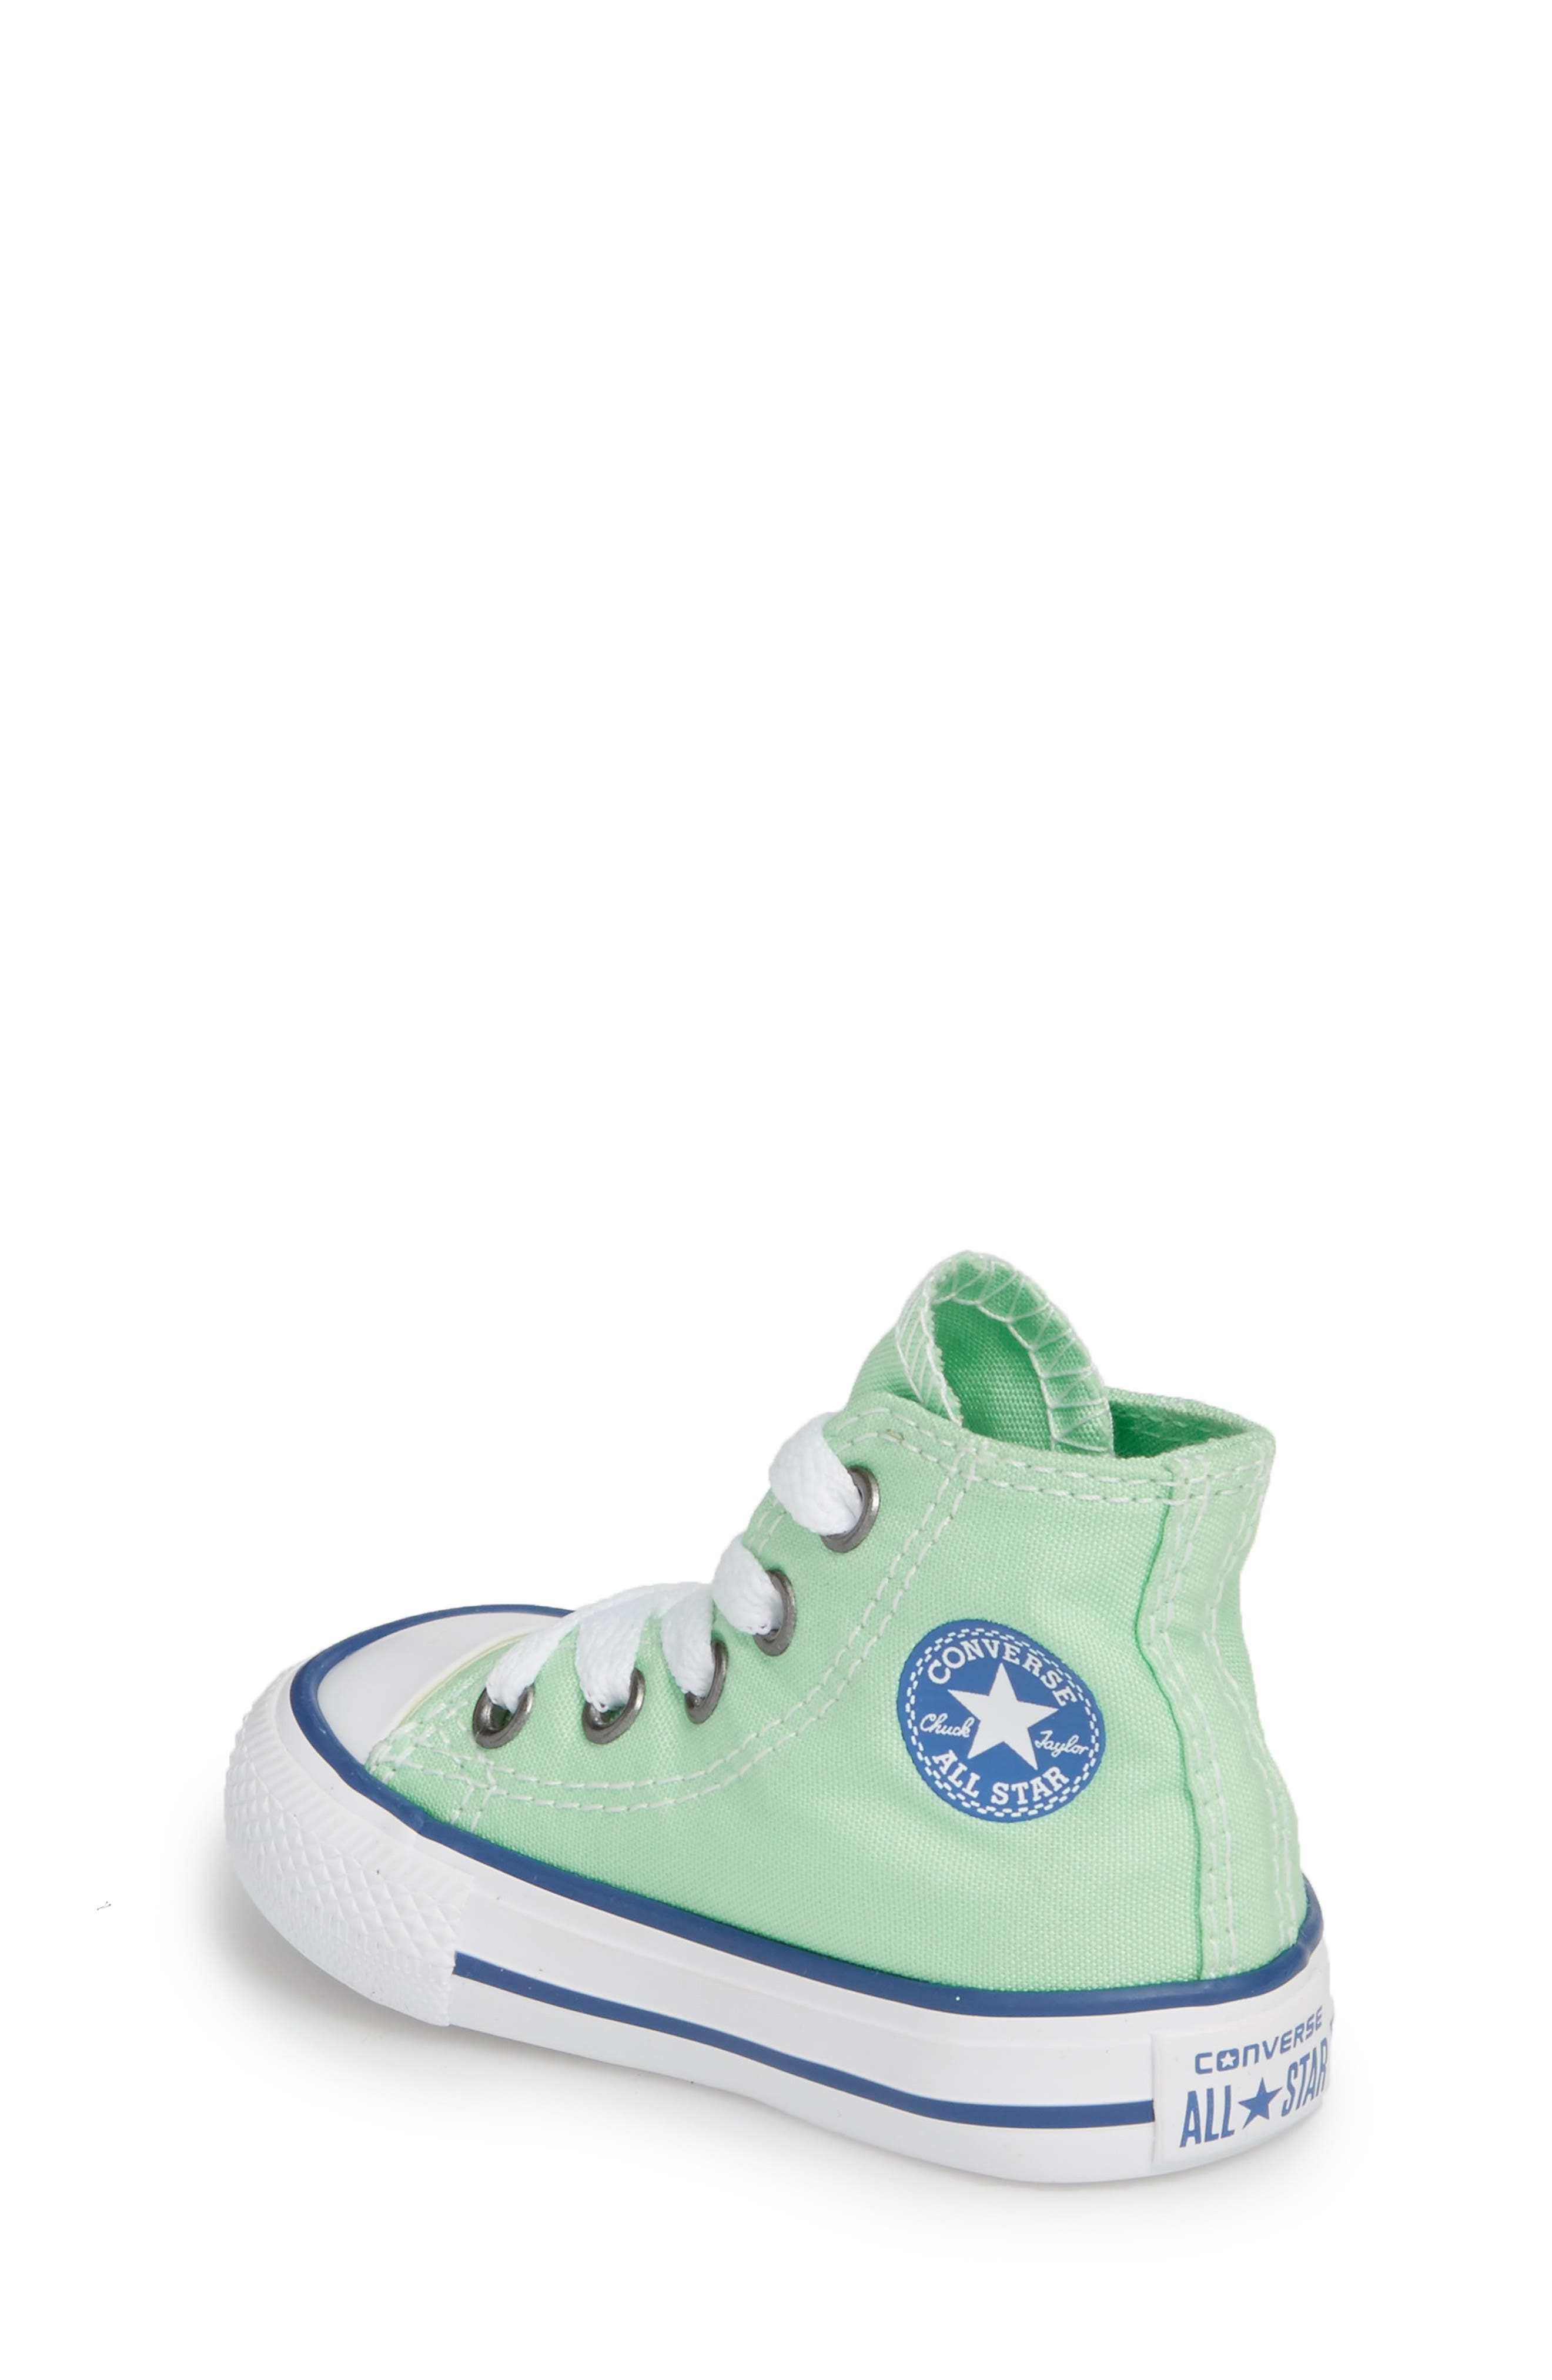 Chuck Taylor<sup>®</sup> All Star<sup>®</sup> Seasonal High Top Sneaker,                             Alternate thumbnail 2, color,                             336